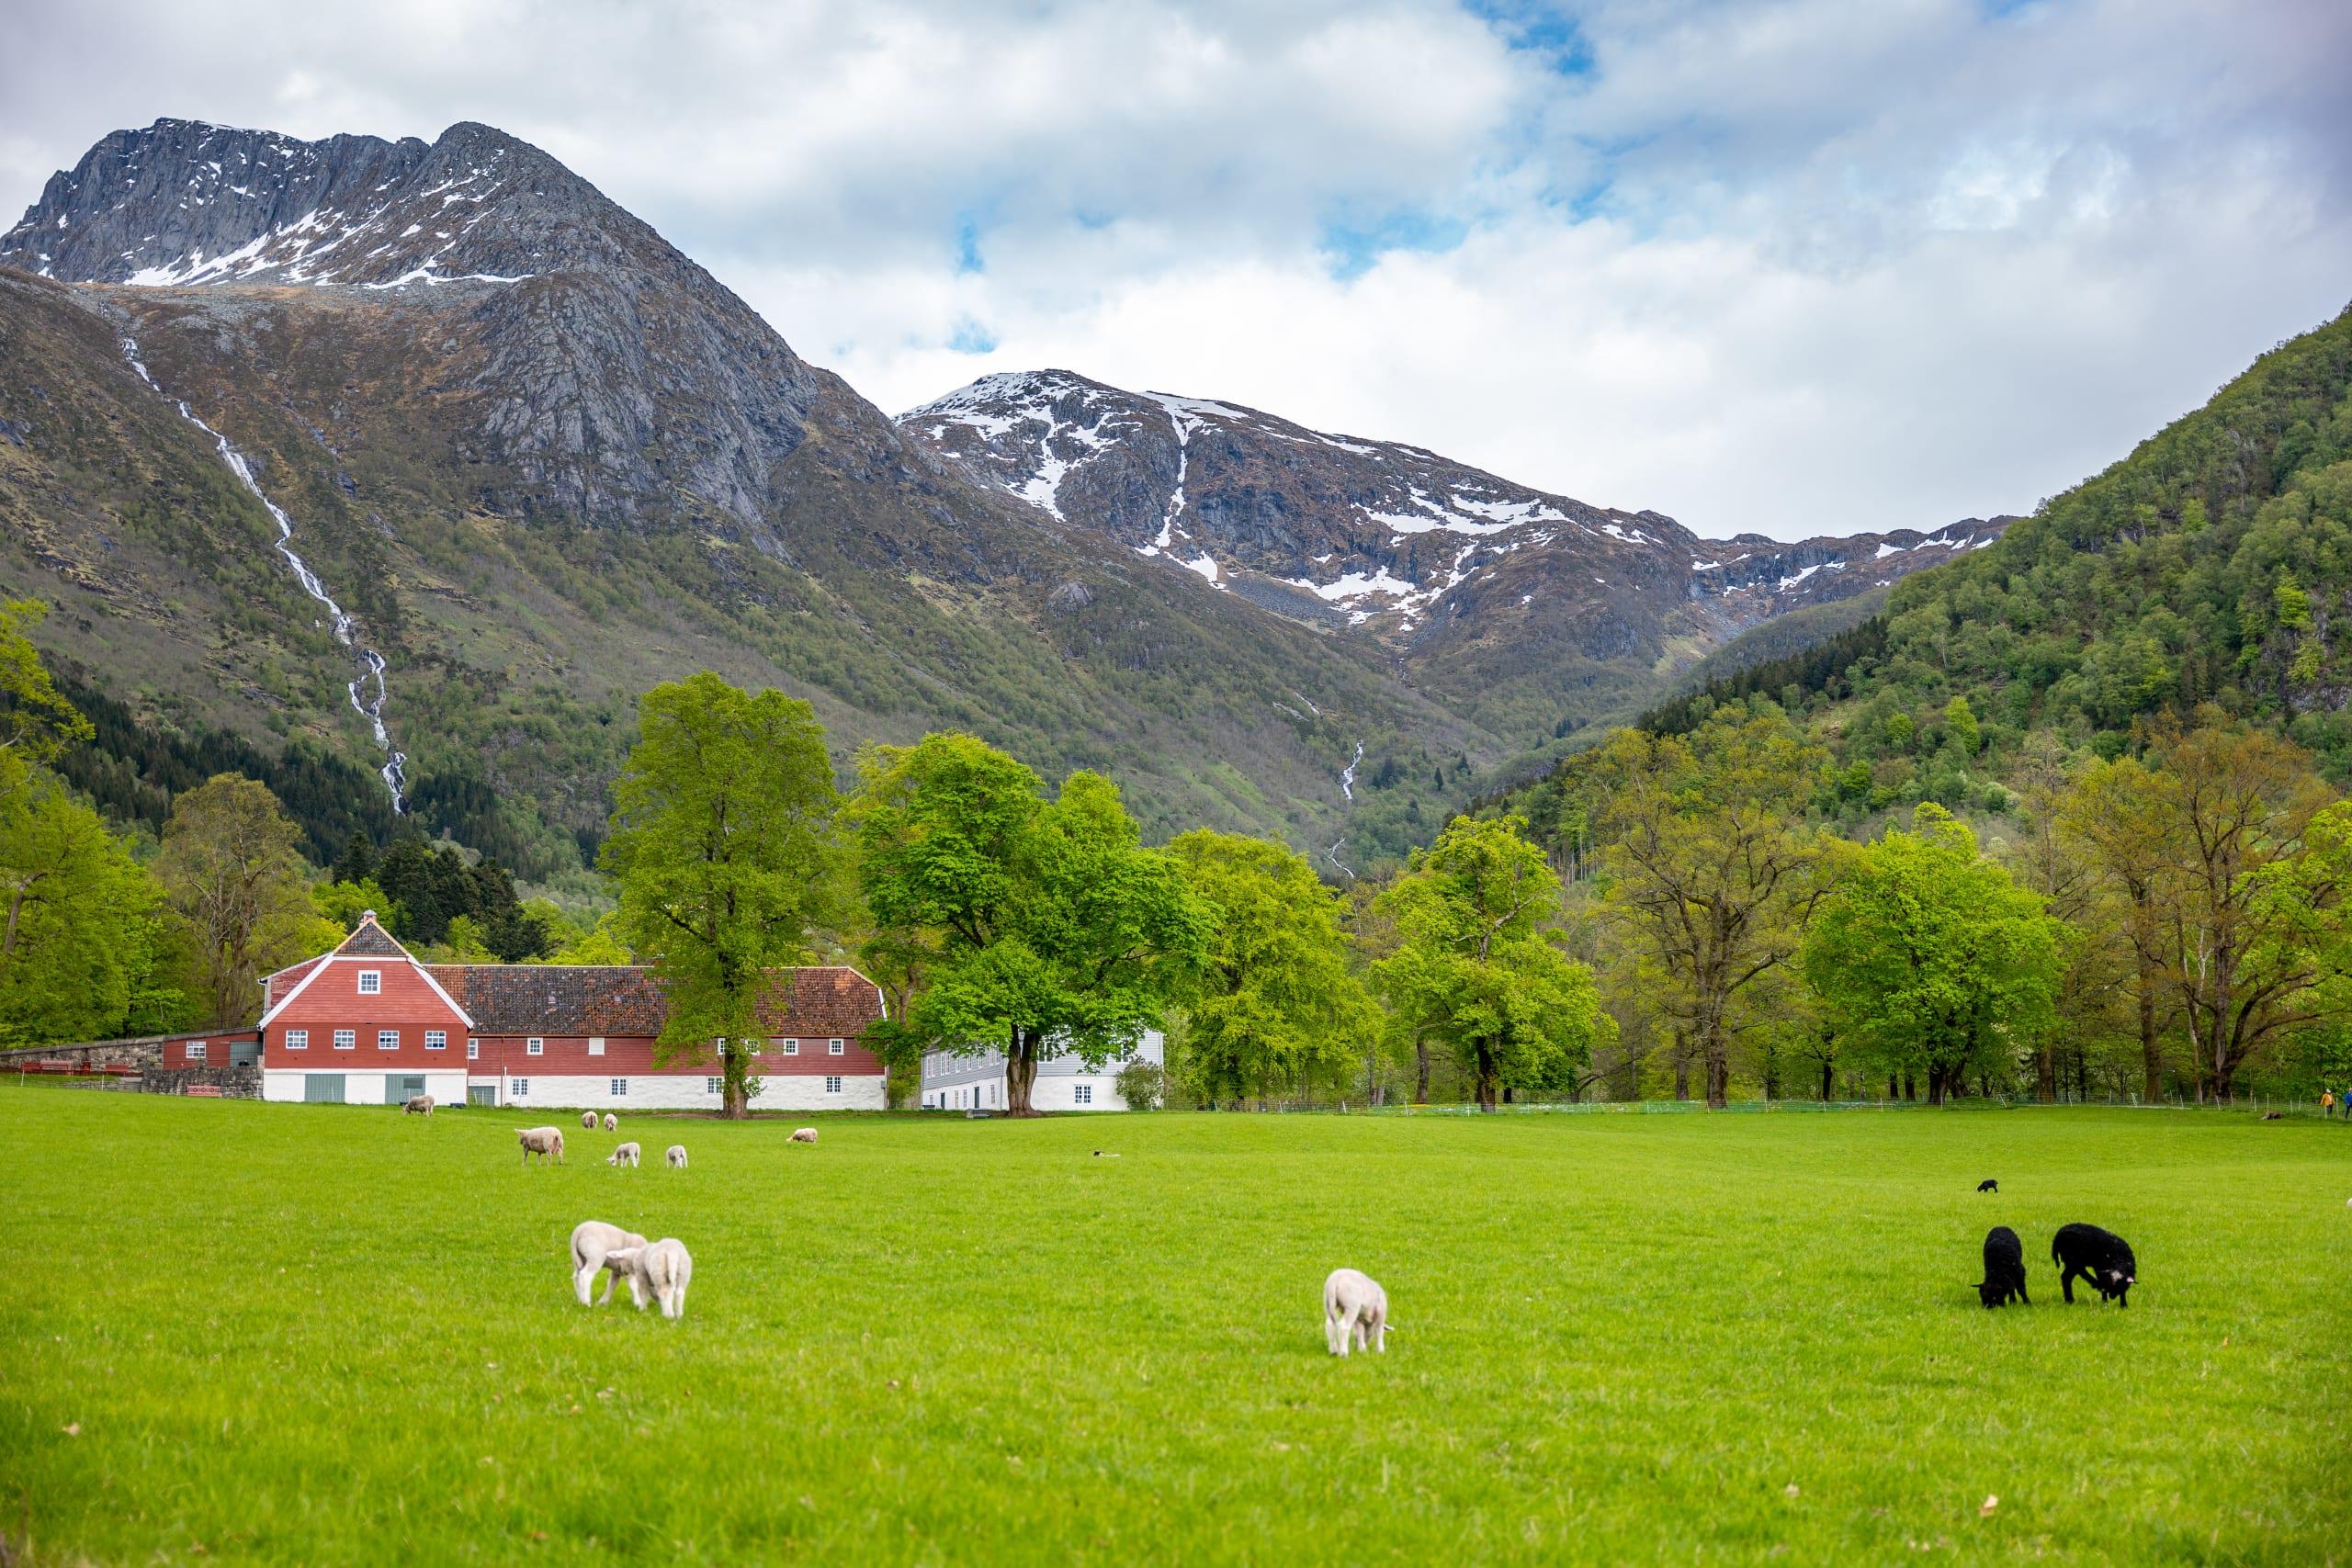 Grazing lamb in Rosendal